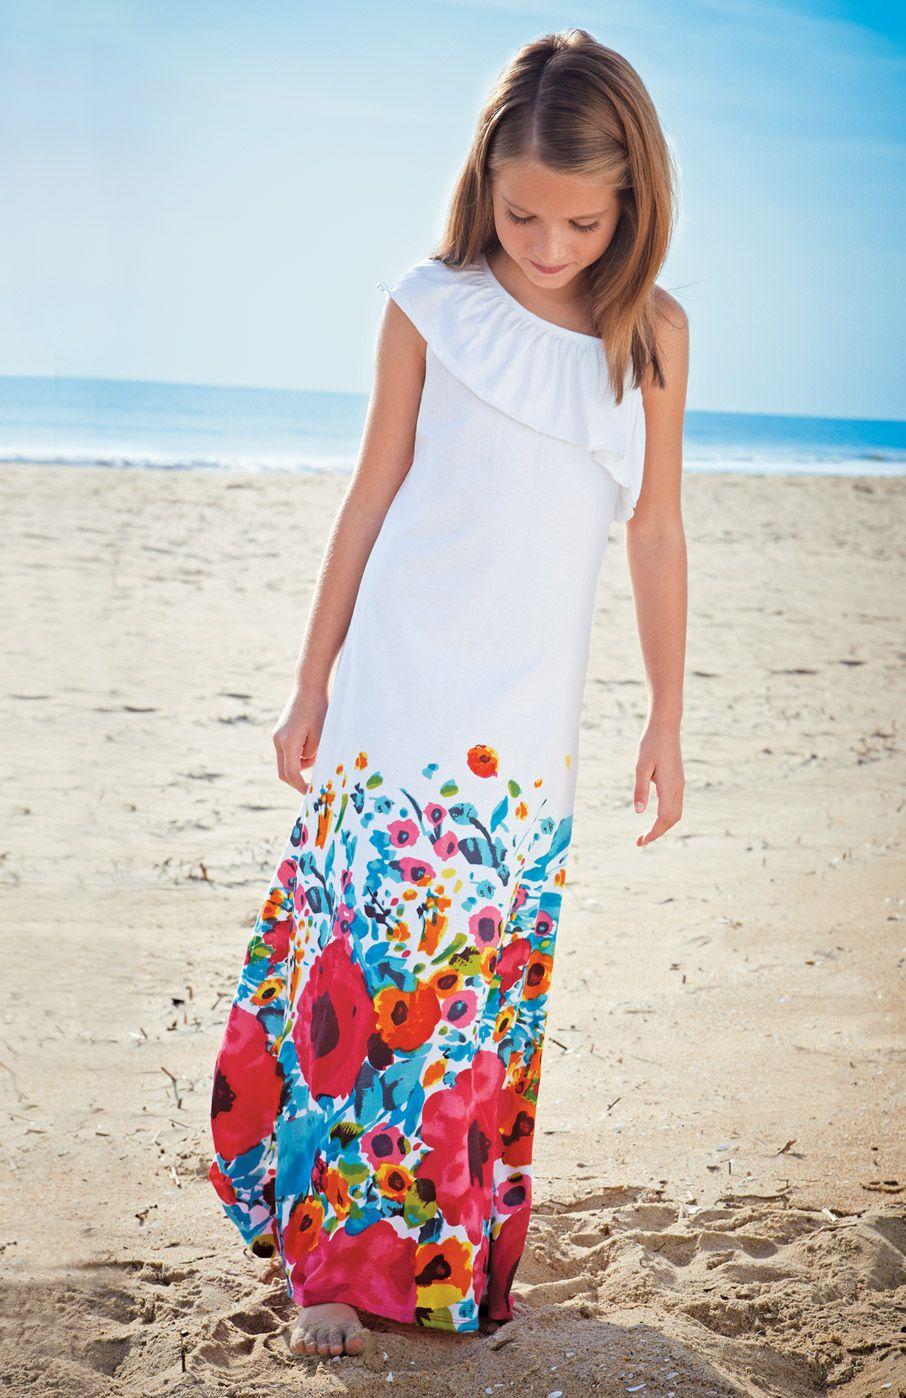 Girls Clothing by Mulberribush | Tween Fashions | Pinterest | Girl ...